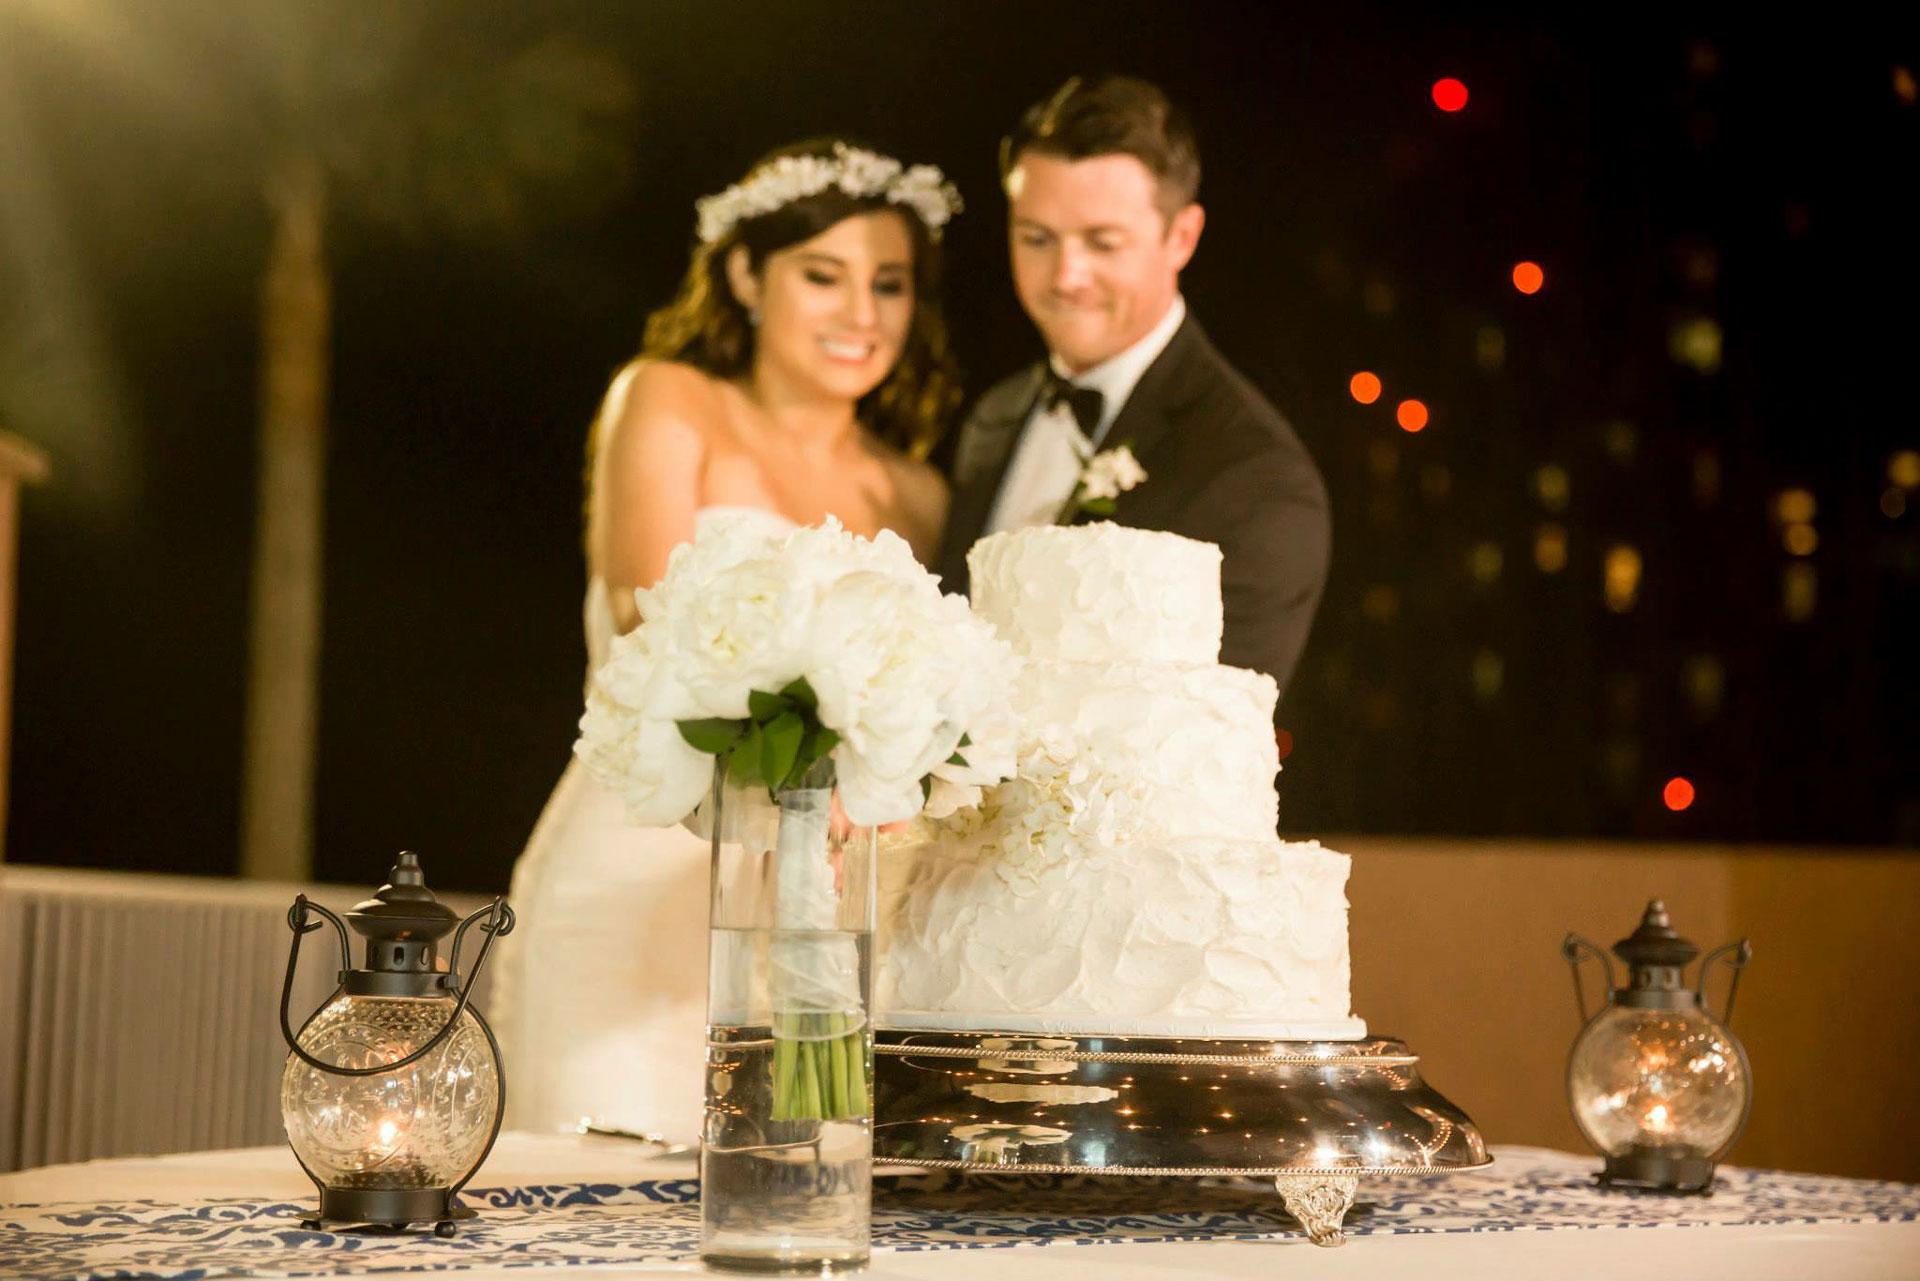 bride and groom cutting wedding cake at night